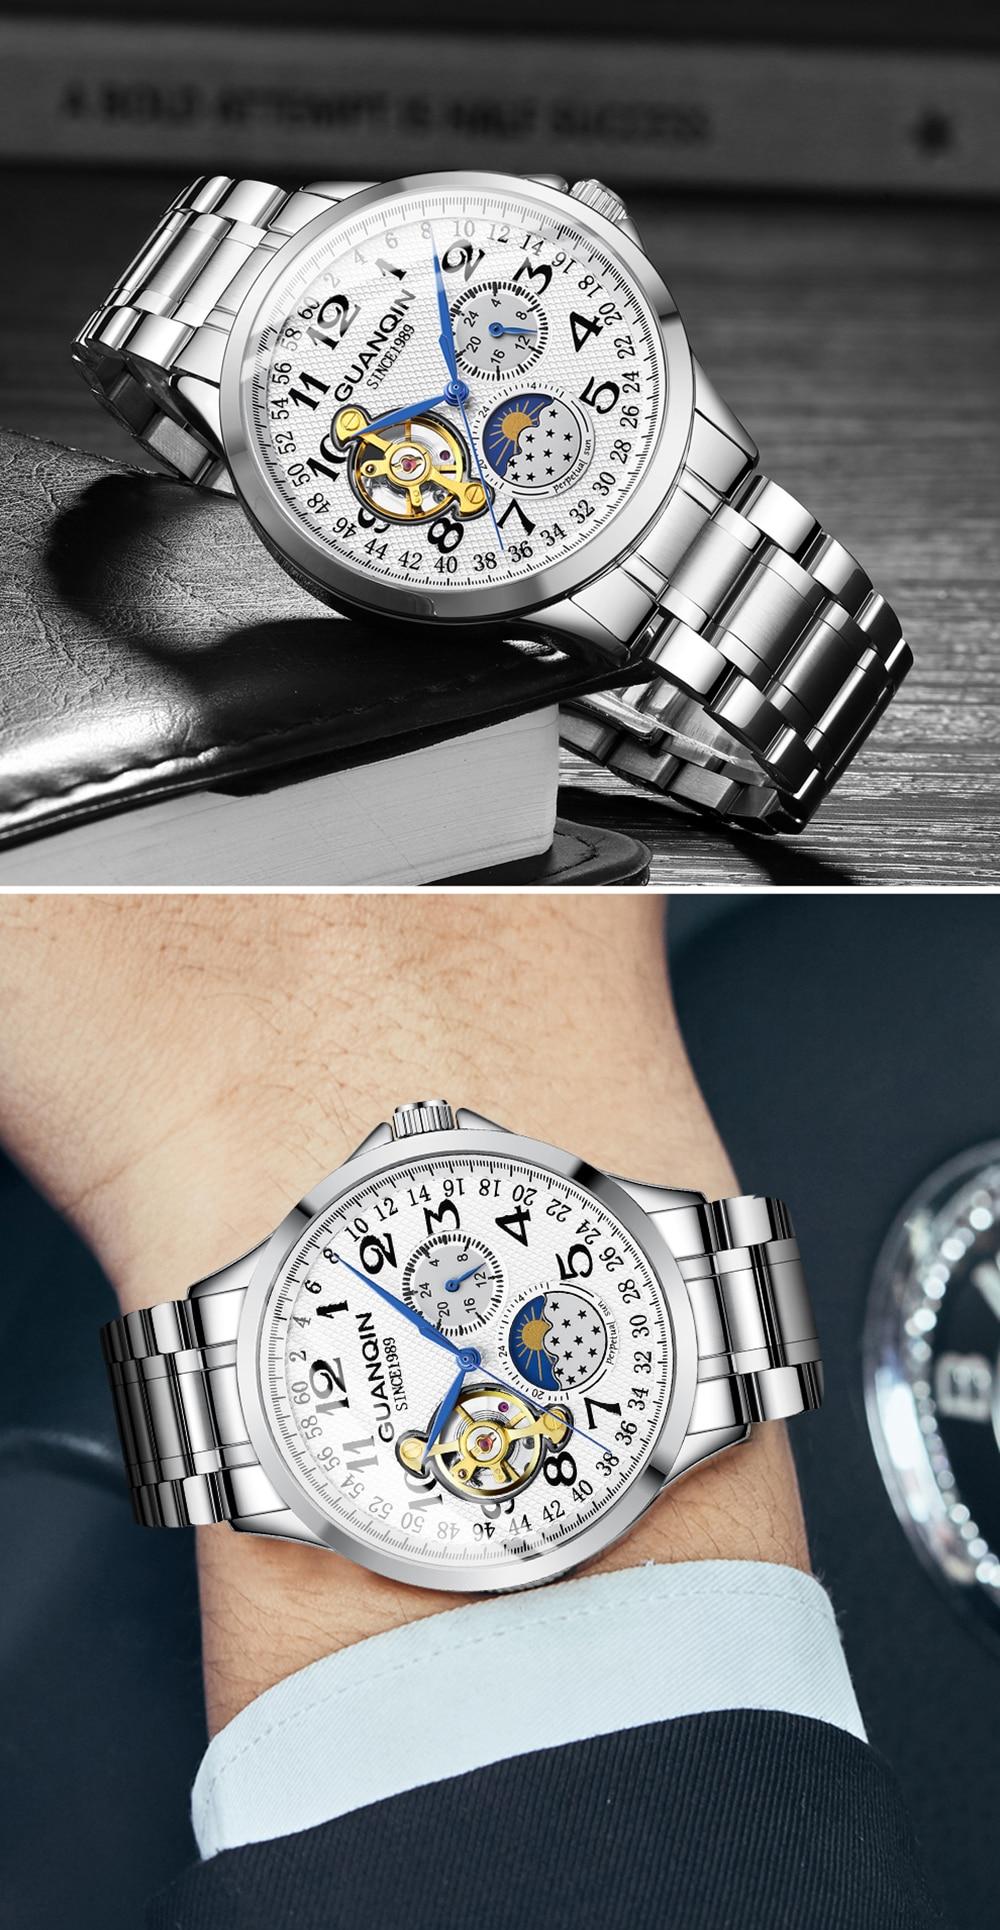 HTB1sH61XMaH3KVjSZFjq6AFWpXaG GUANQIN mechanical watch men waterproof automatic skeleton tourbillon clock men business top brand luxury Relogio Masculino